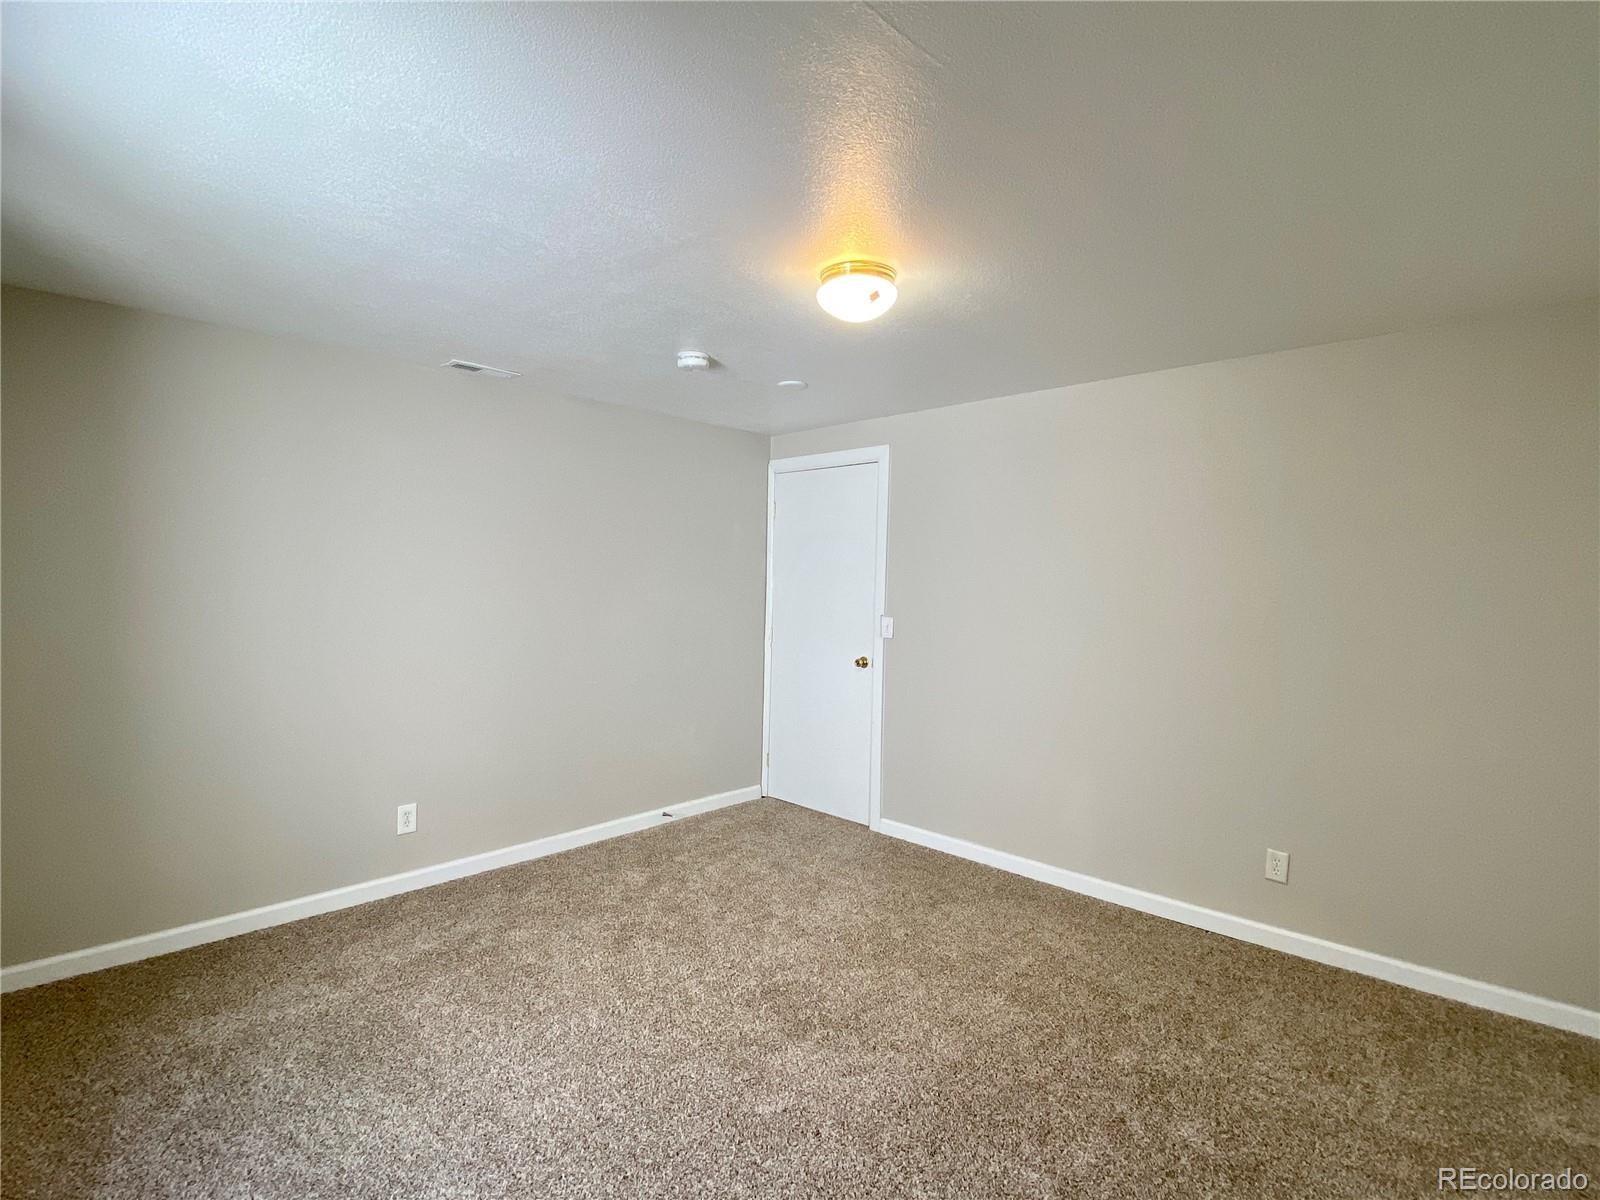 MLS# 6788673 - 20 - 5311 Suburban , Colorado Springs, CO 80911